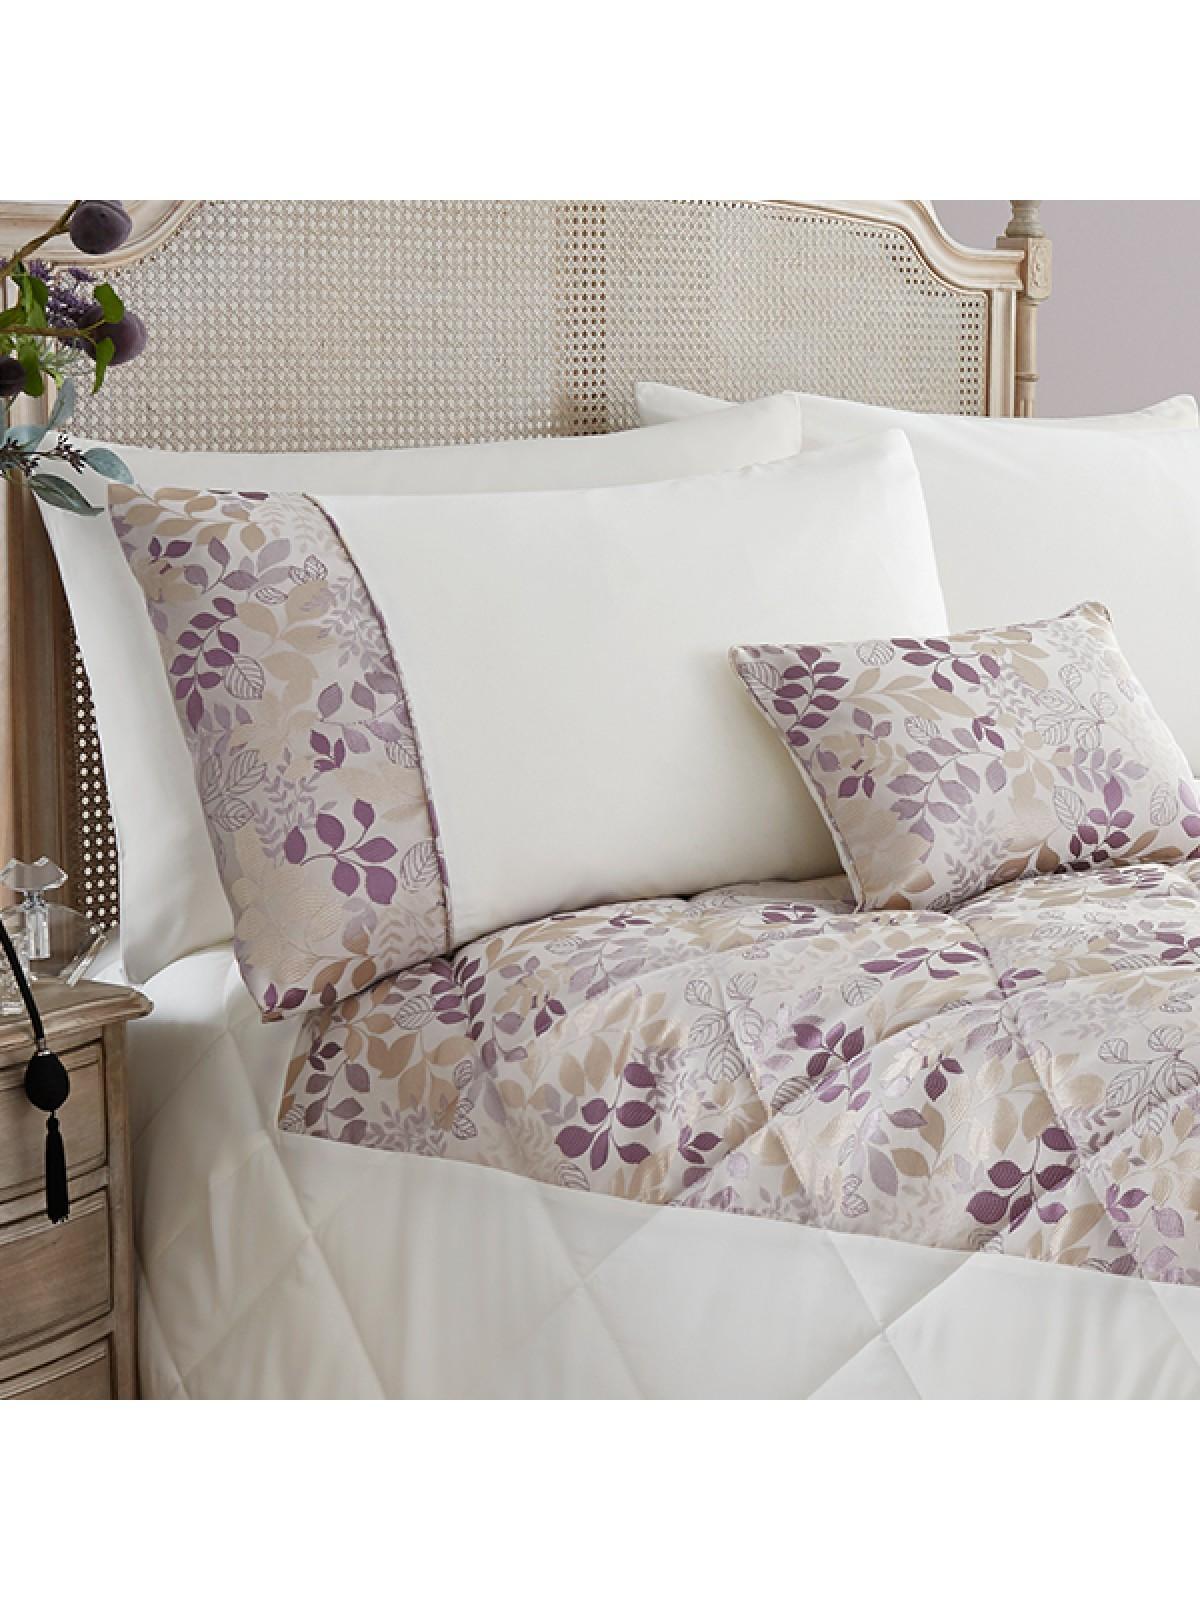 Jules Leaf Jacquard Bedspread Heather Ponden Home Bedcover Previousnext Zoom